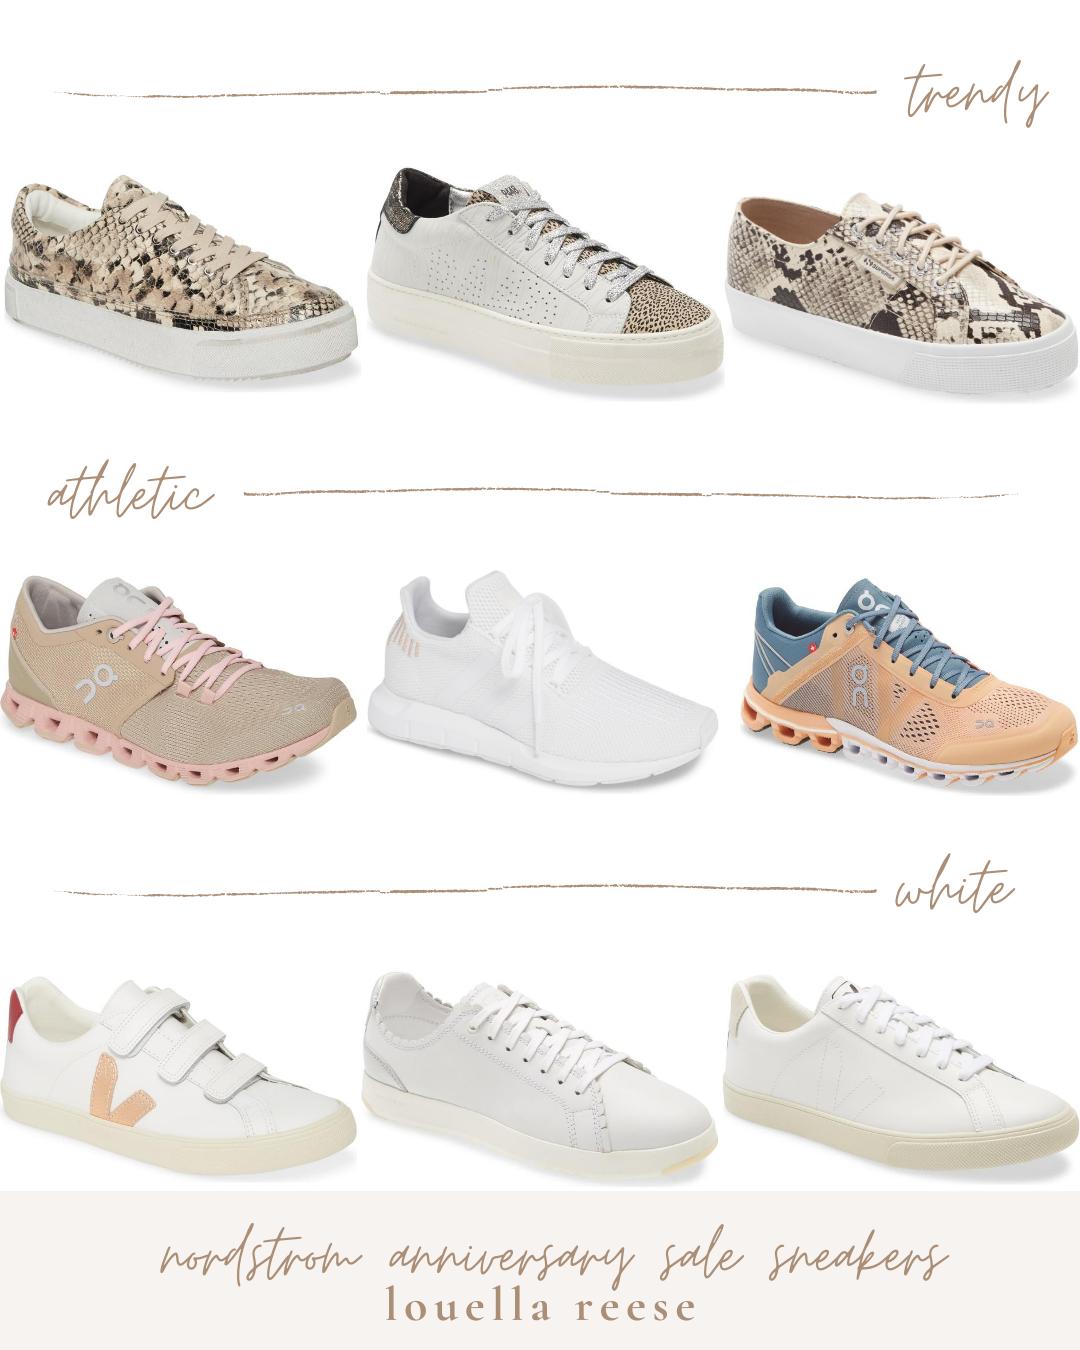 2020 Nordstrom Anniversary Sale Sneakers | Louella Reese